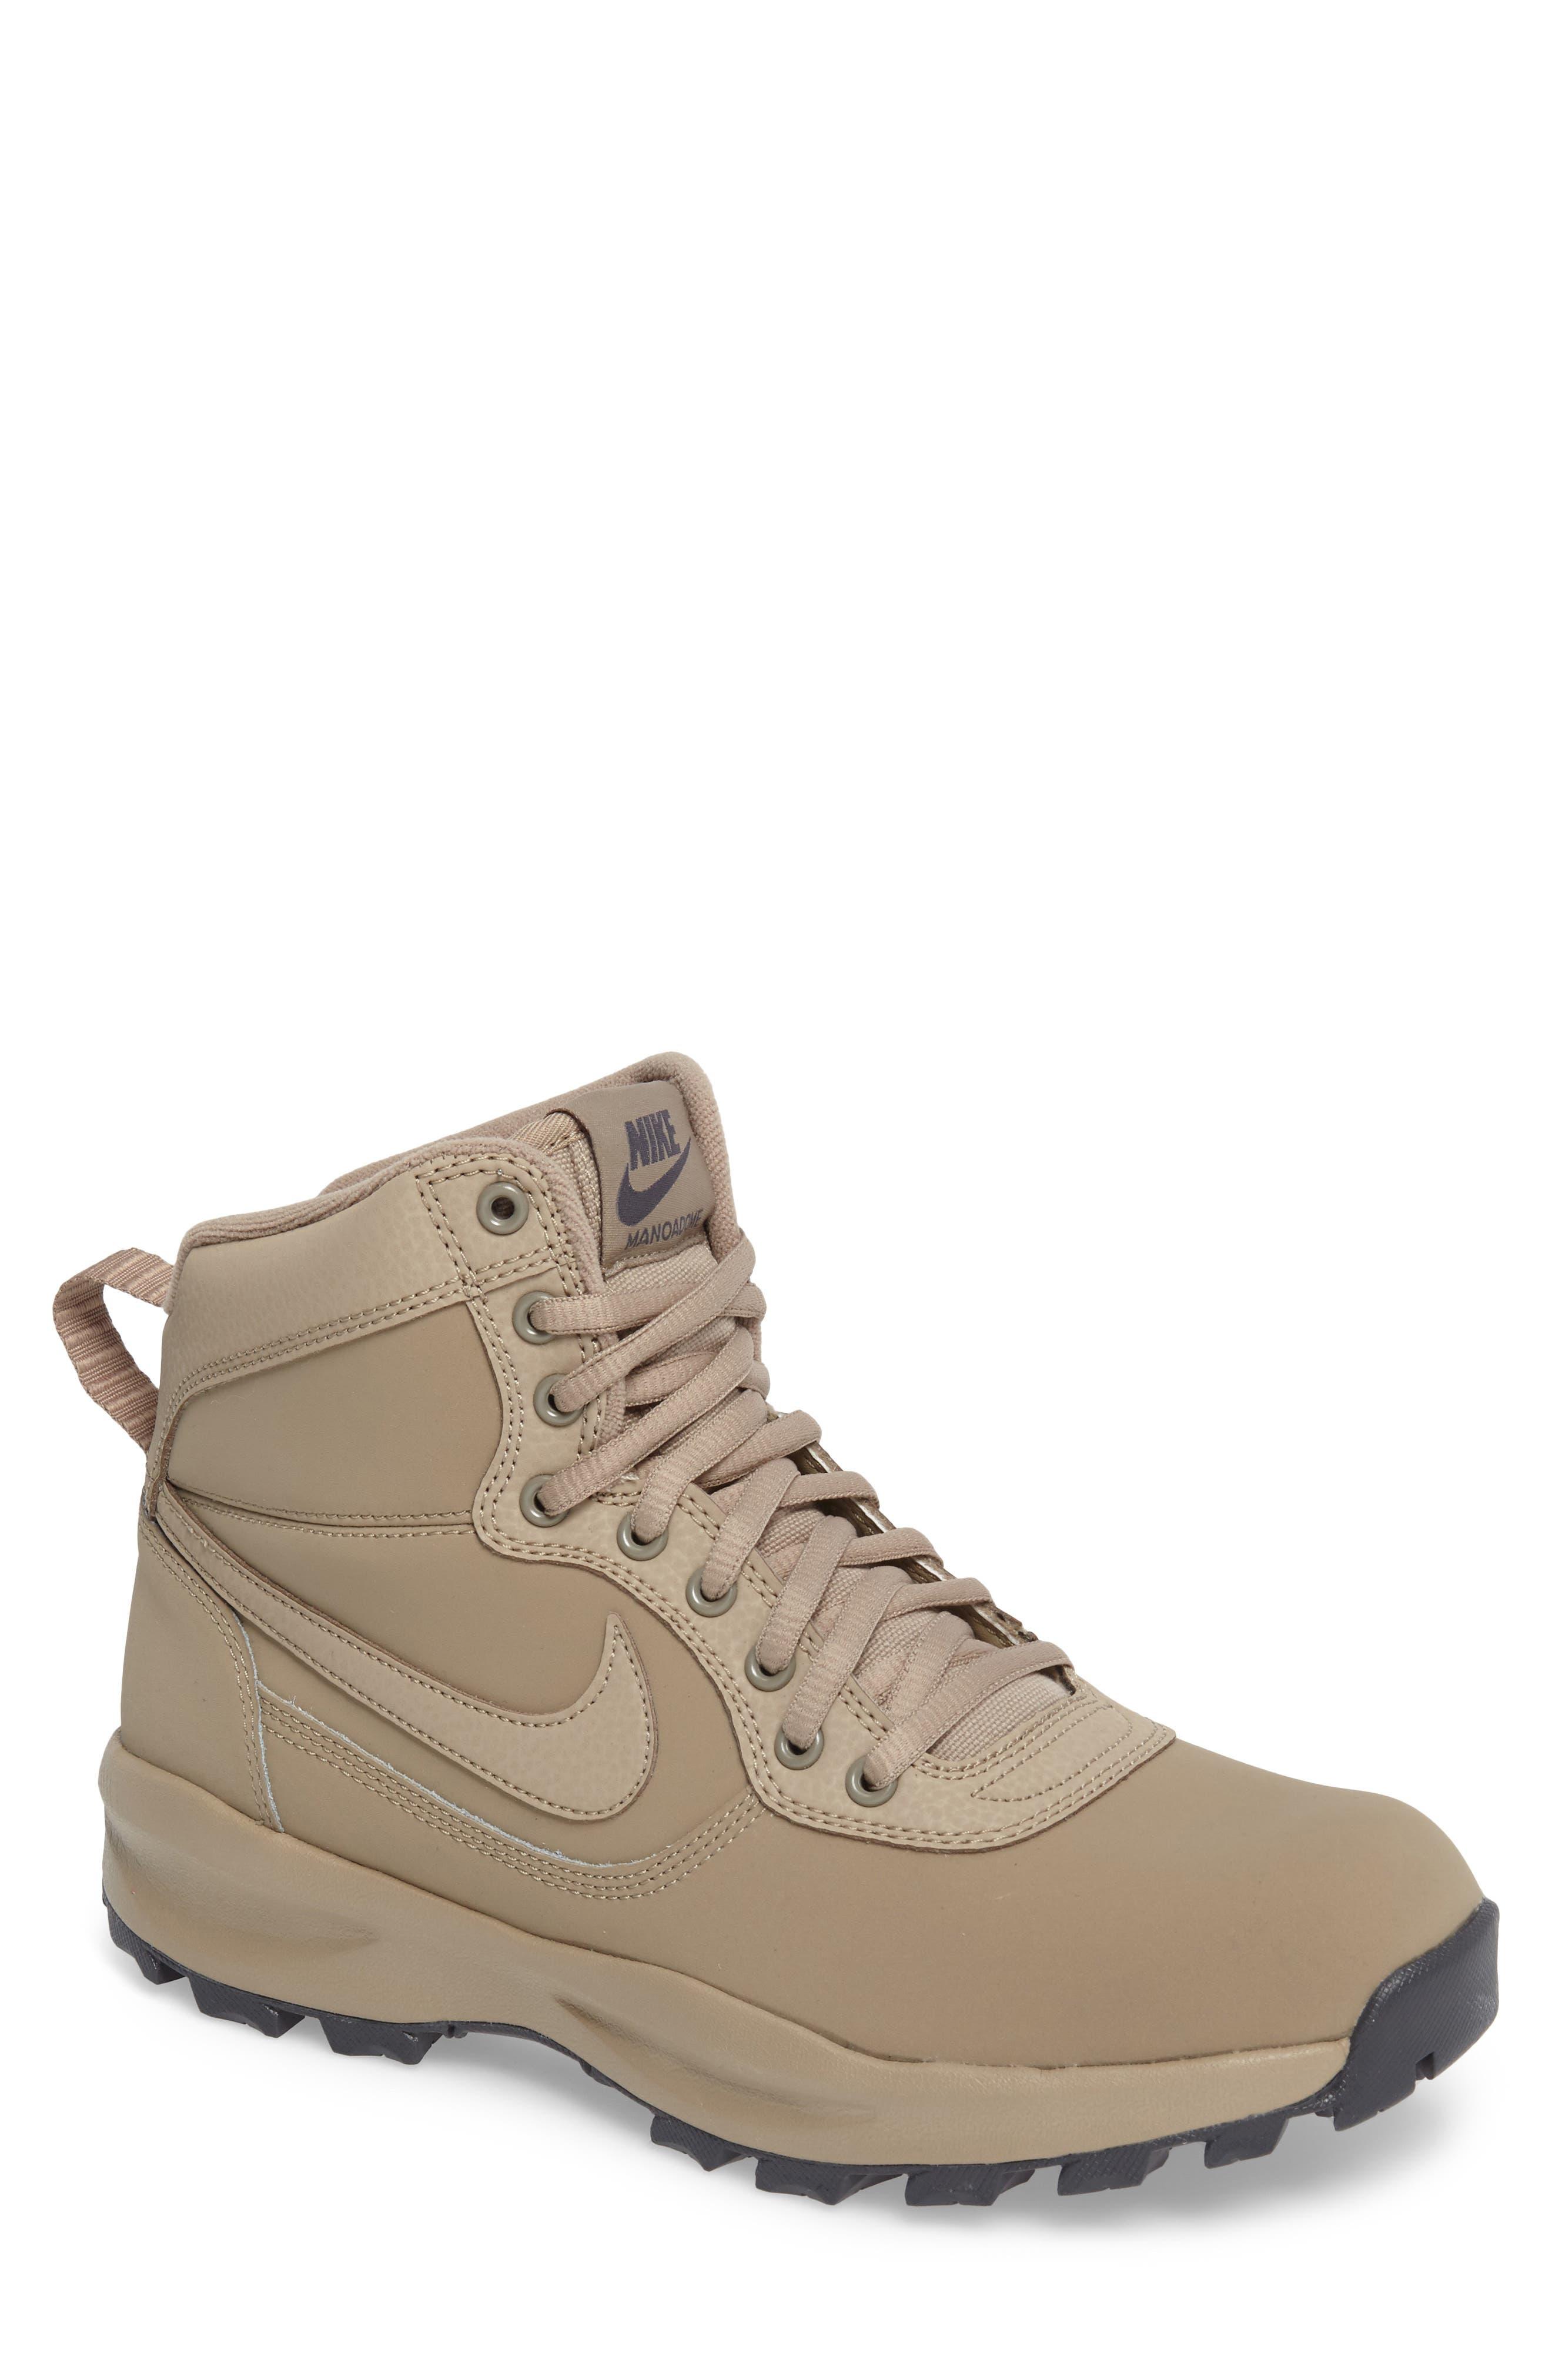 Manoadome Boot,                         Main,                         color, Khaki/ Khaki/ Dark Grey